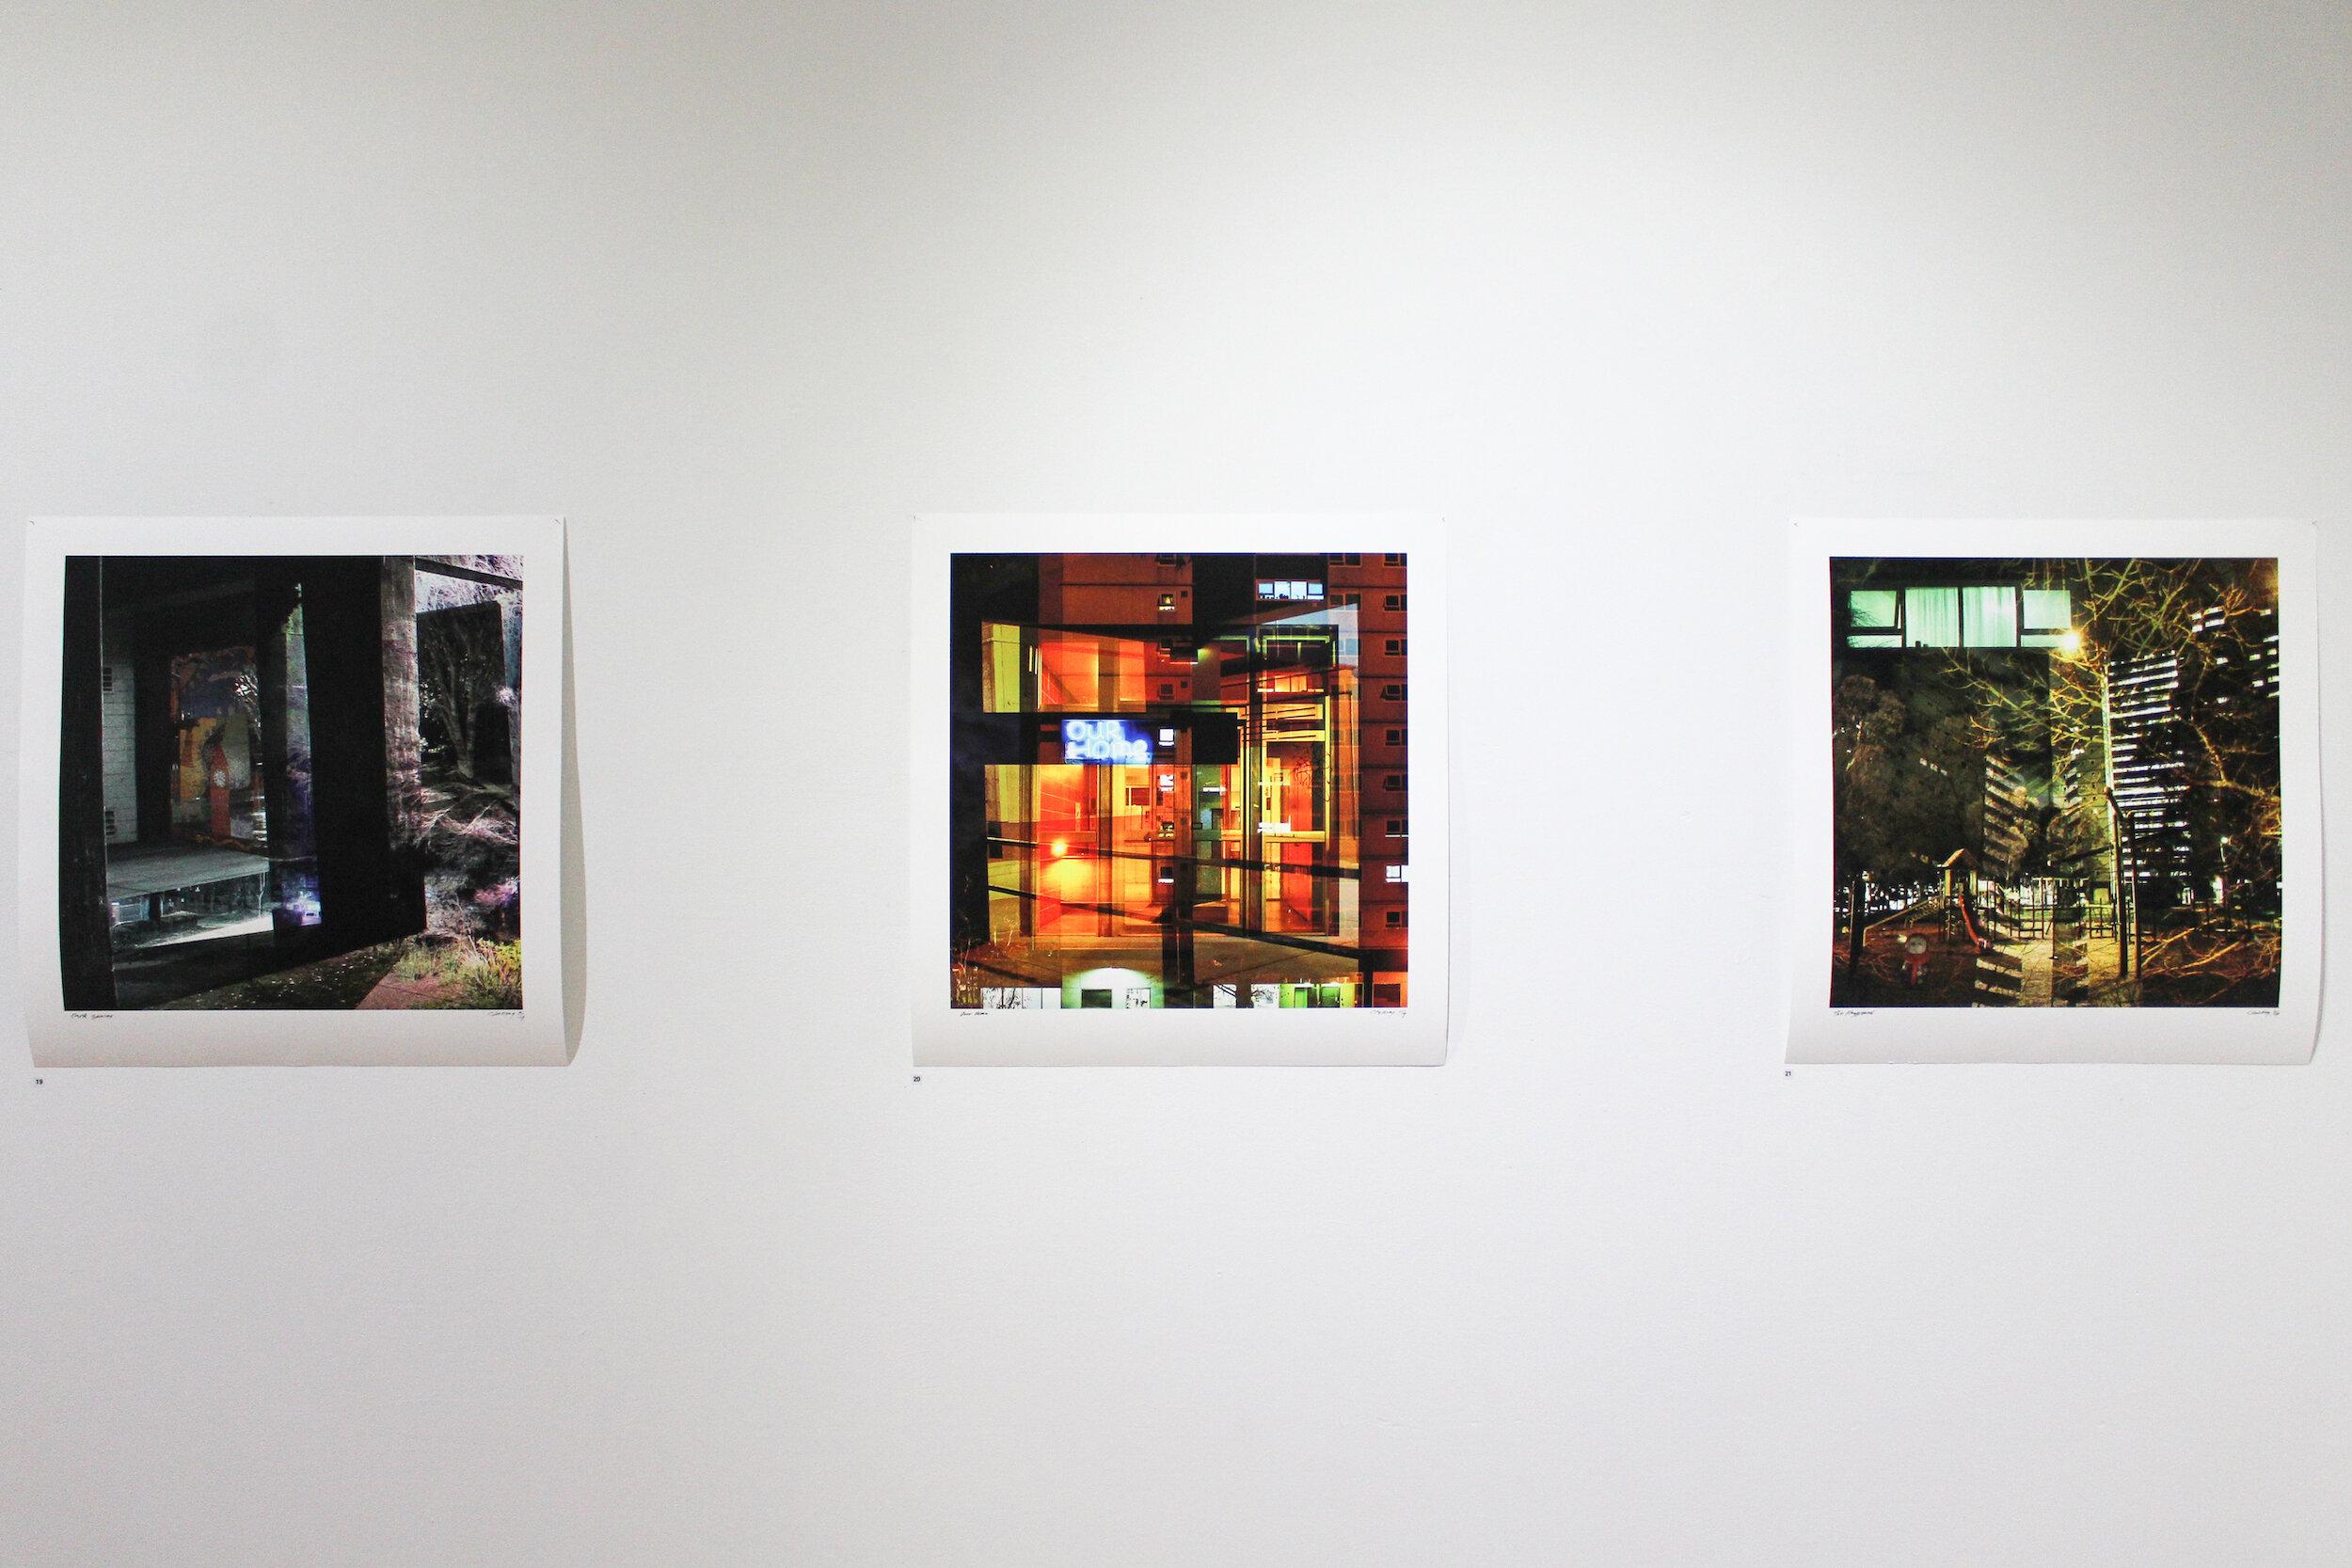 Chris May.  Dark Spaces , giclée print, 60 x 60cm,  Our Home , giclée print, 60 x 60cm,  The Playground , giclée print, 60 x 60cm